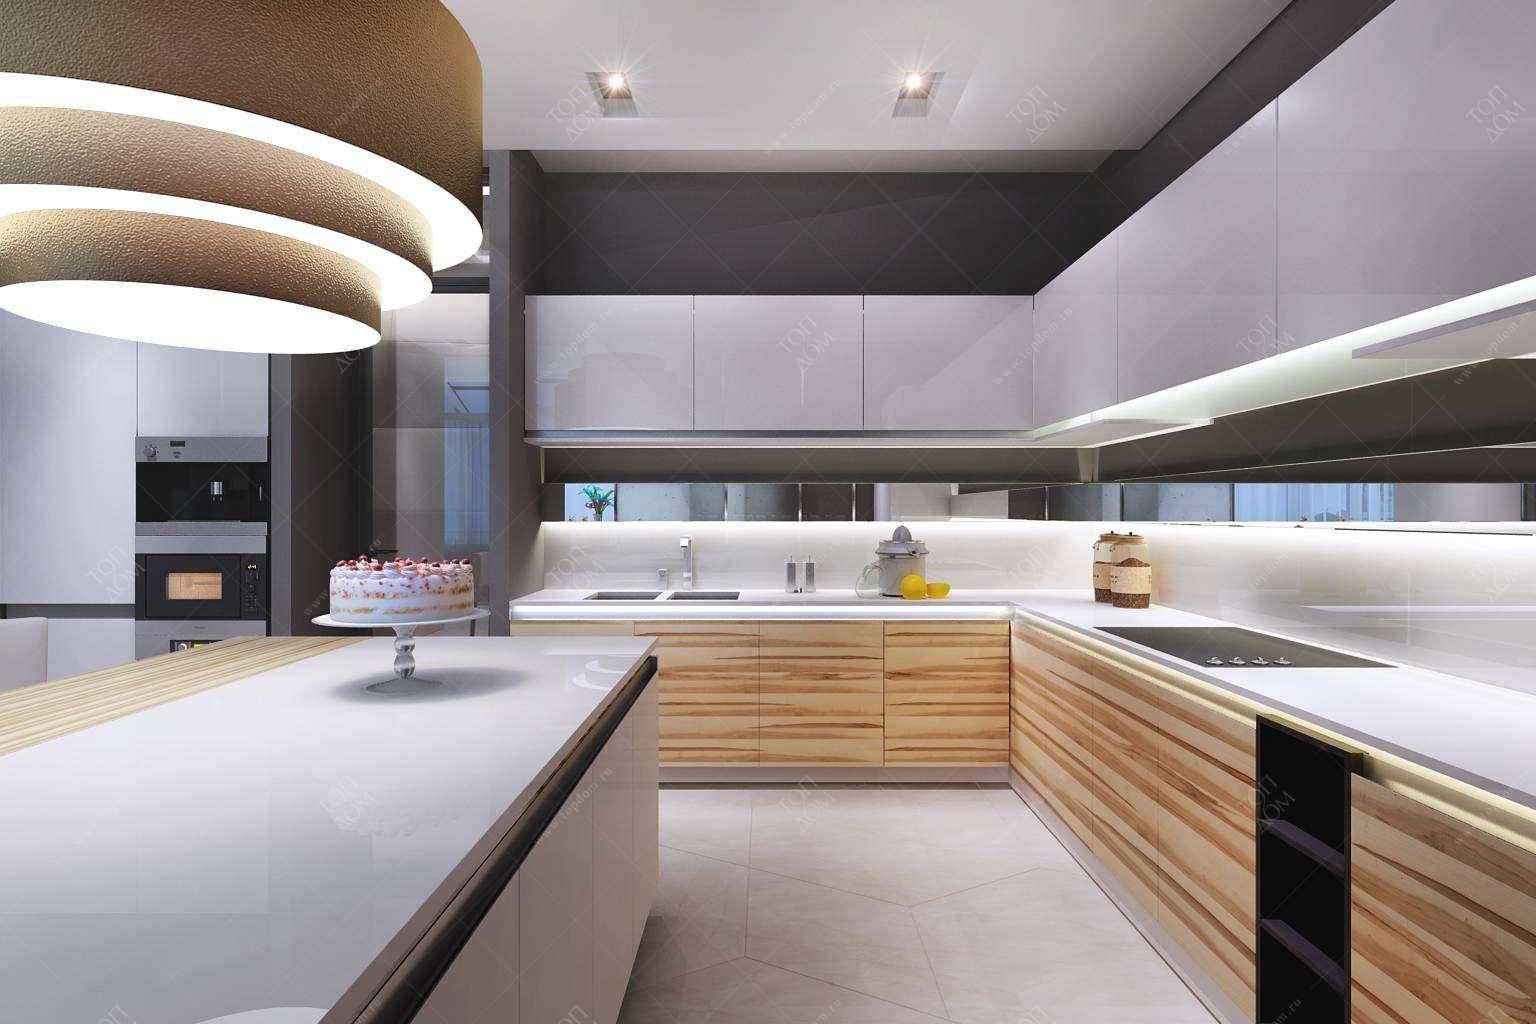 Дизайн интерьера кухни 2018 года > 260 фото в квартирах и ...